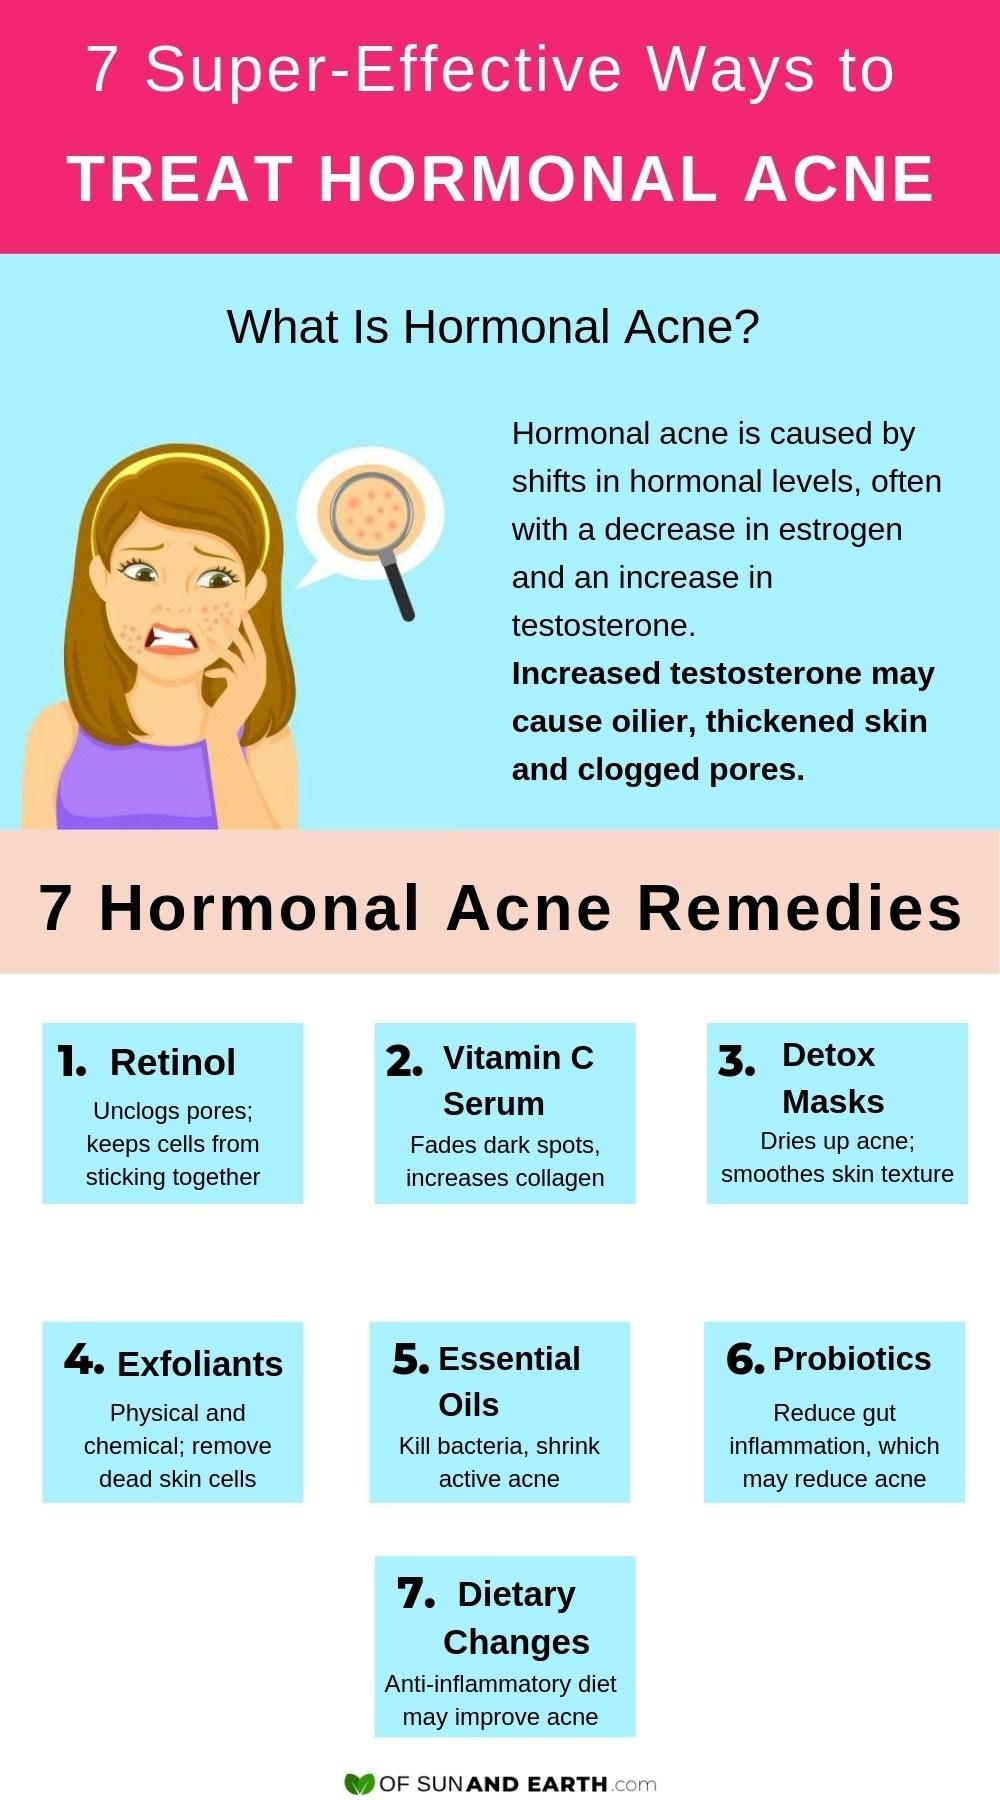 Effective ways to treat hormonal acne